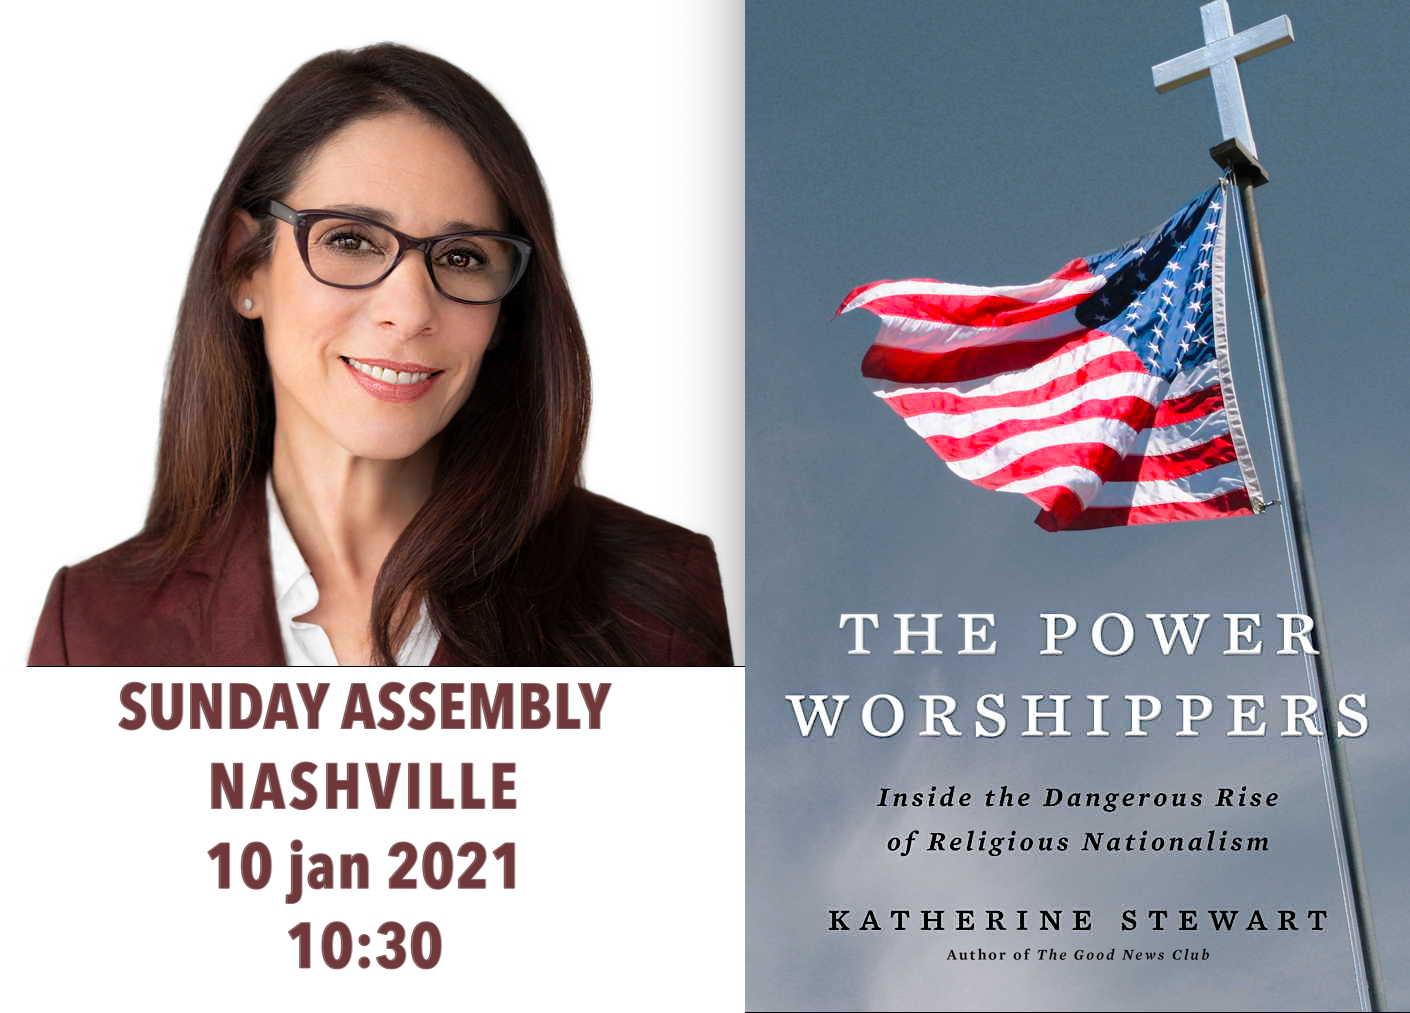 Katherine Stewart - the Power Worshippers